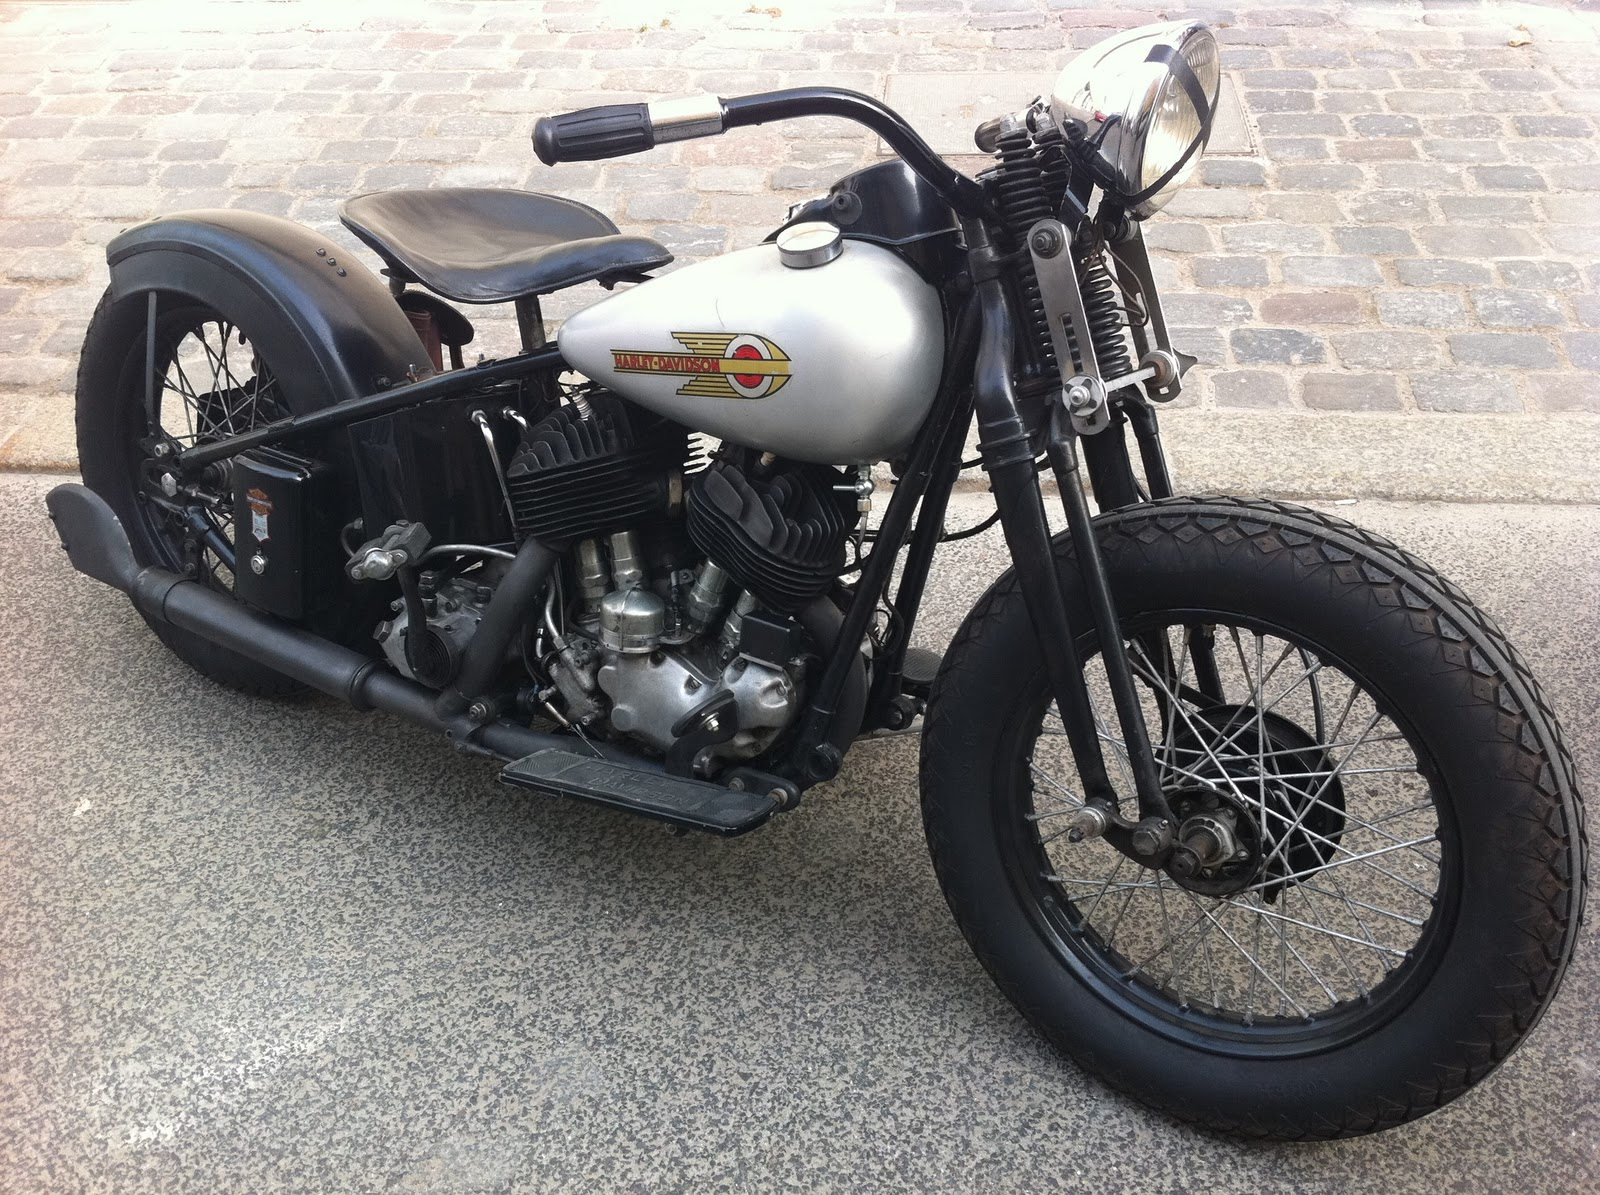 Harley+Flathead+Engine Harley Davidson Flathead Engine   Car Interior ...